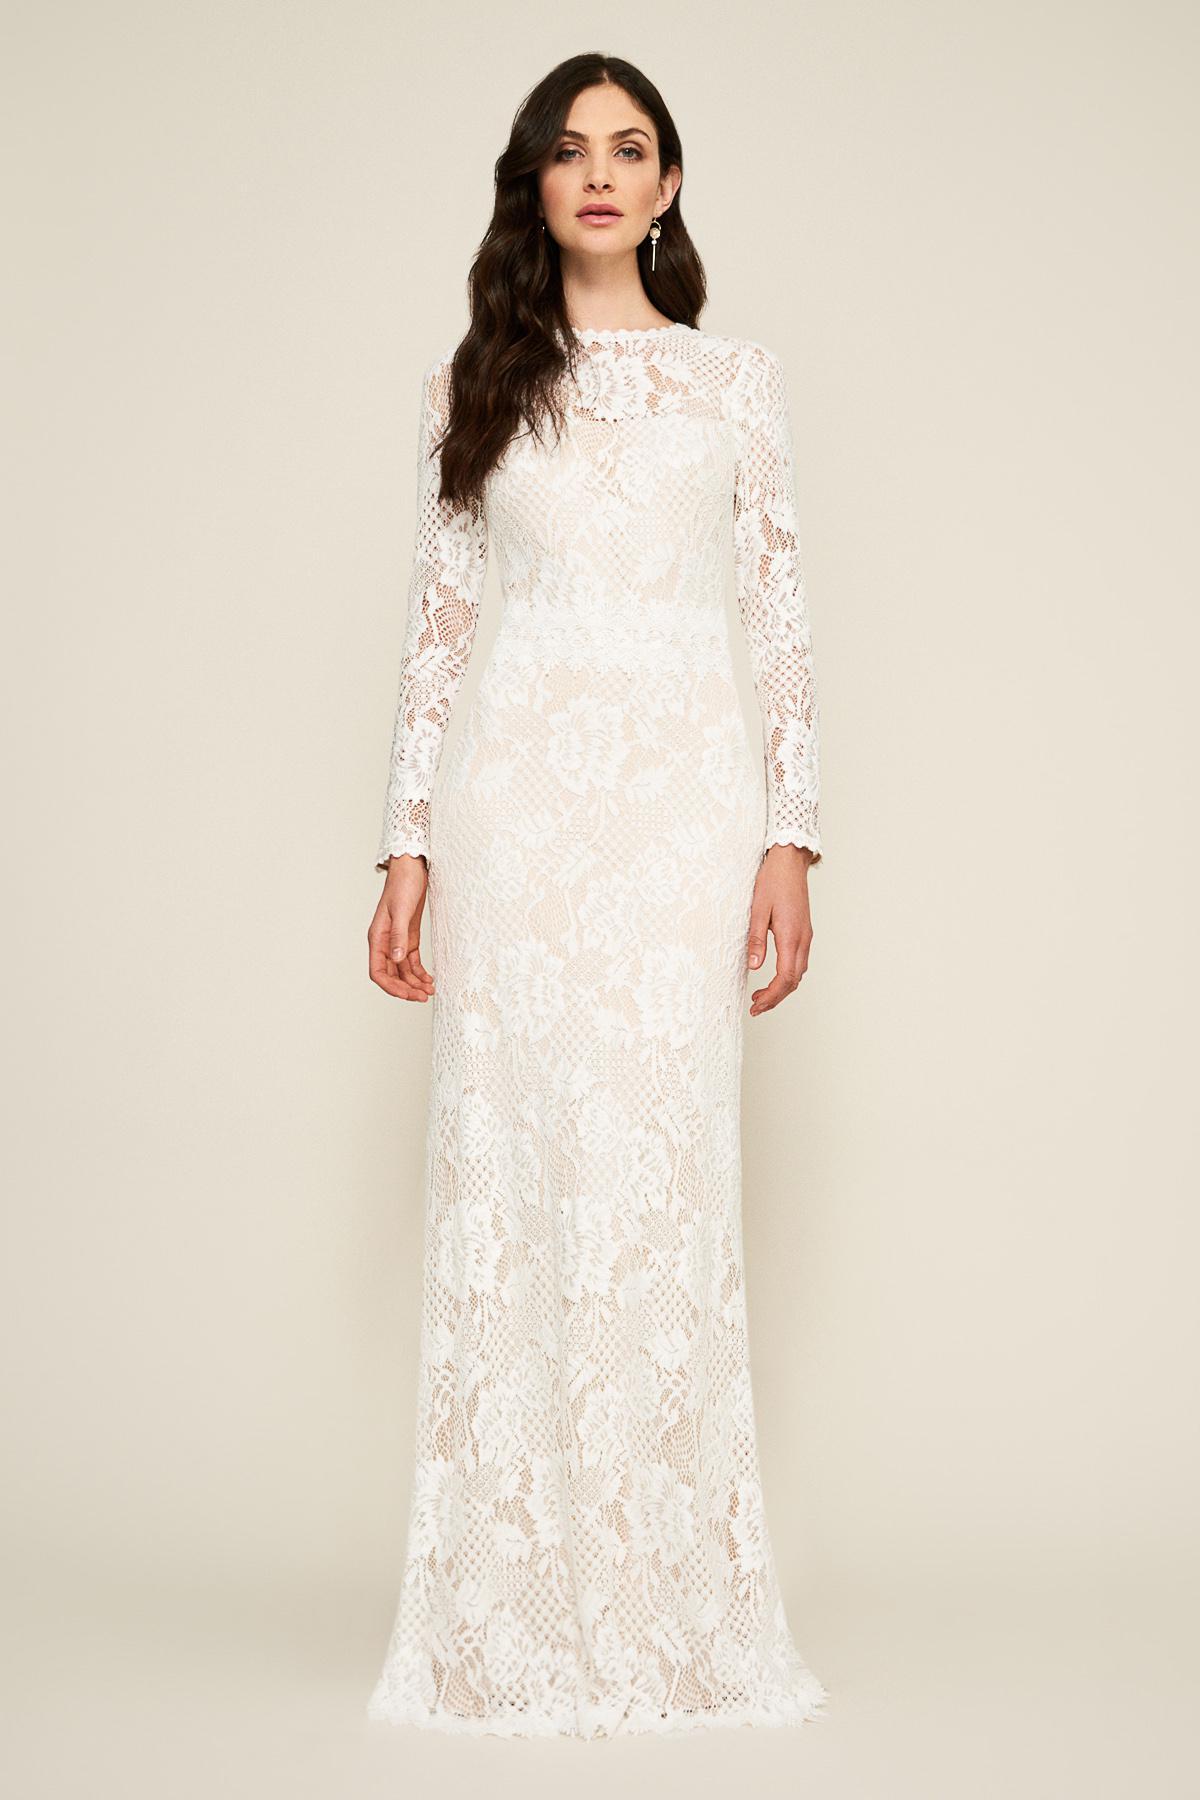 Lyst - Tadashi Shoji Mckinney Long-sleeve Lace Gown